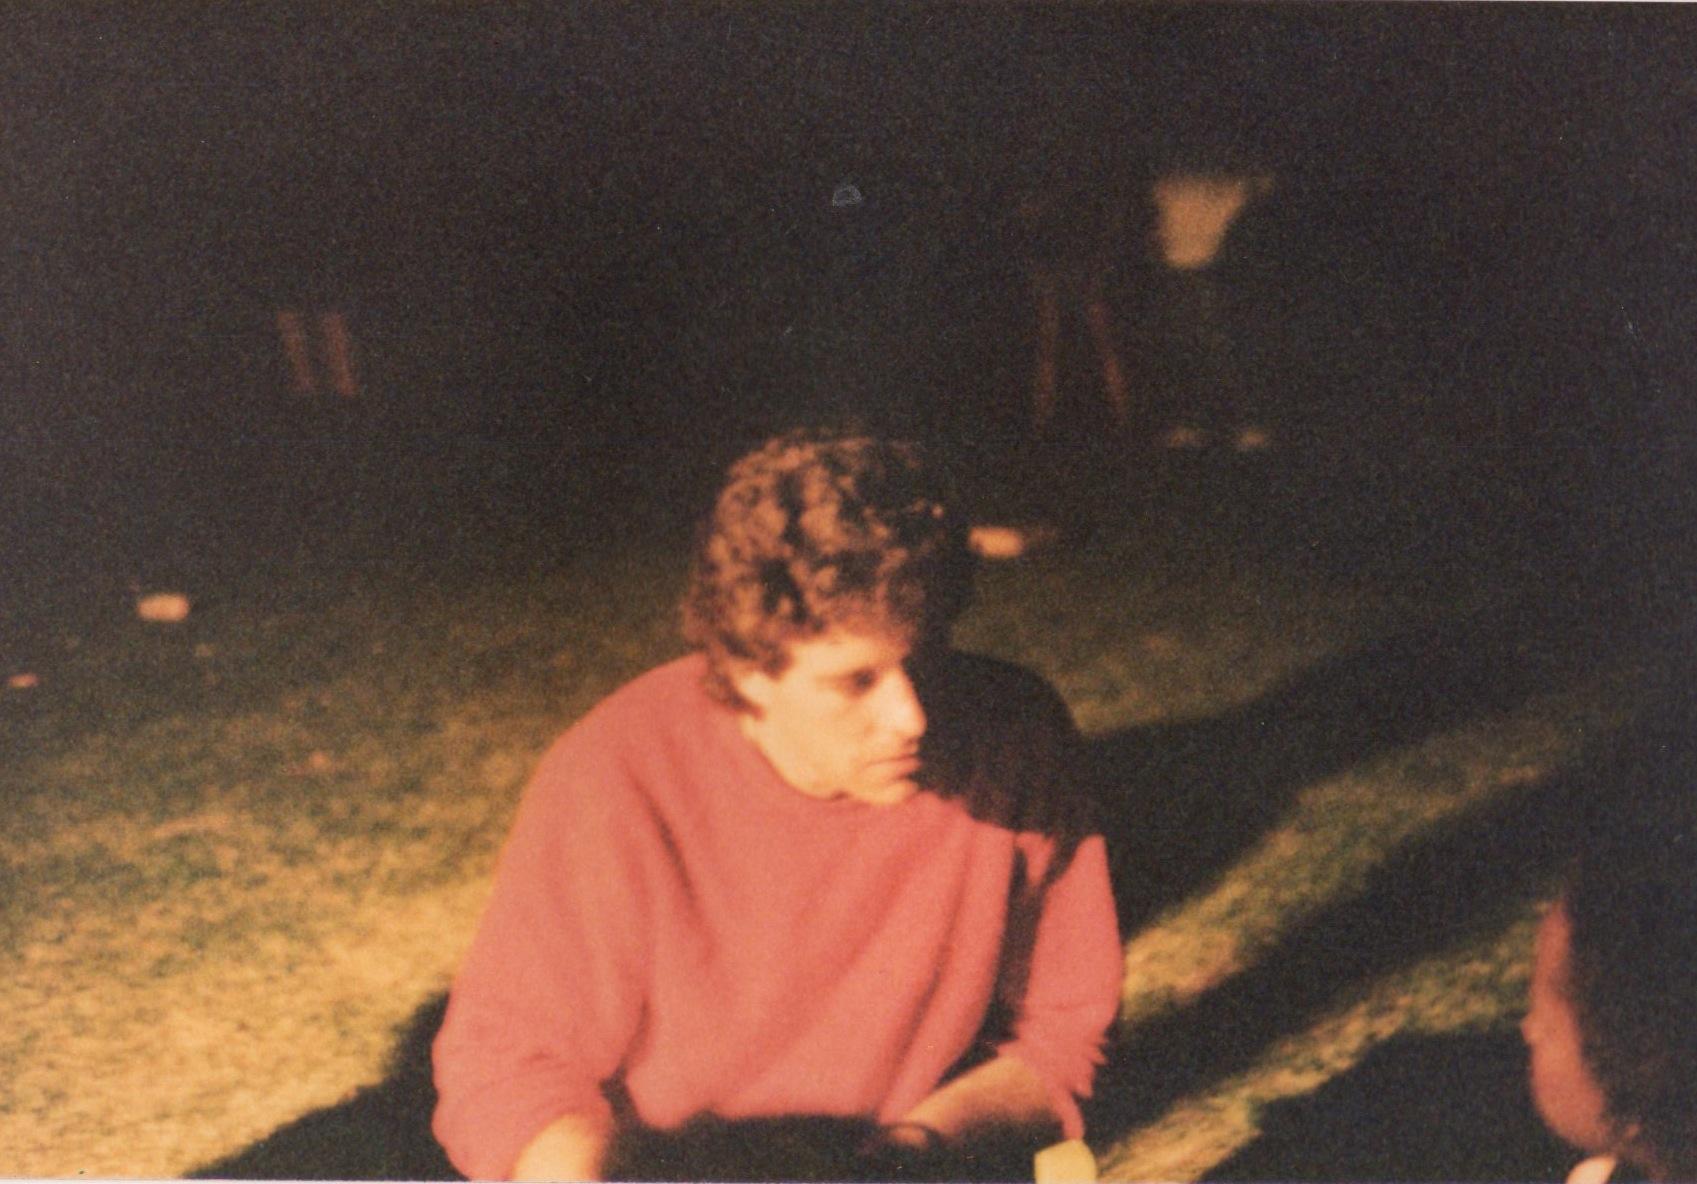 alan goldberg sydney 83